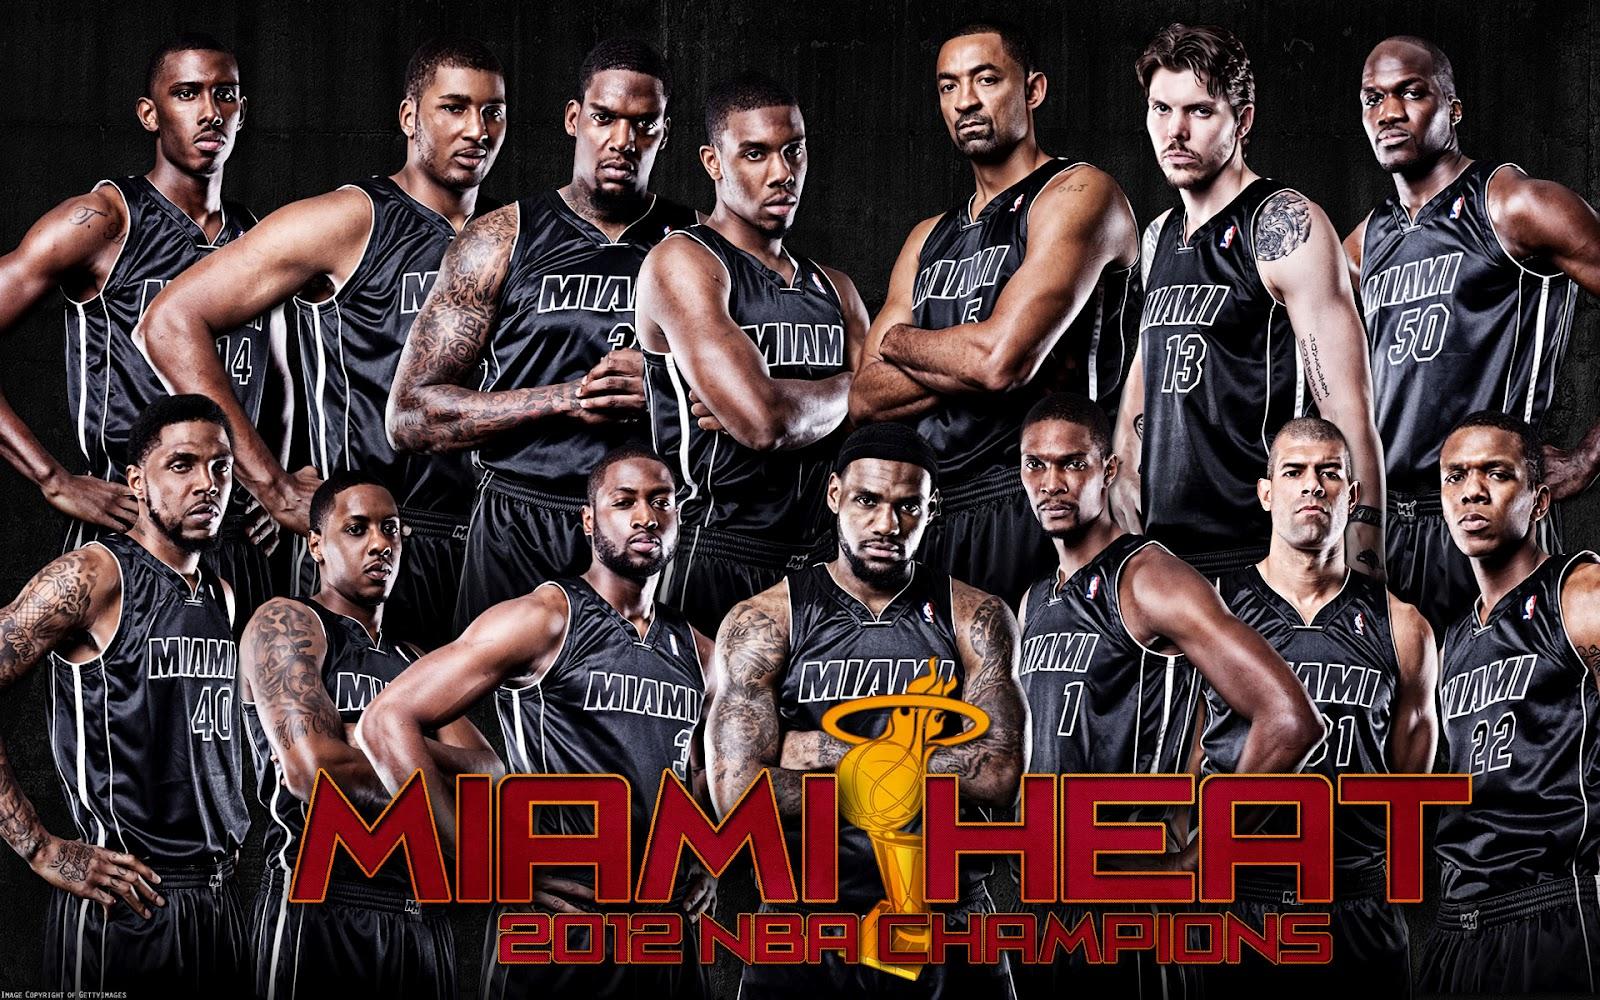 http://3.bp.blogspot.com/-pQQboUbSoDg/UD-fJXQa2sI/AAAAAAAAFuE/io6k8IewGcs/s1600/Miami-Heat-2012-NBA-Champions-Roster-Wallpaper-BasketWallpapers.com-.jpg